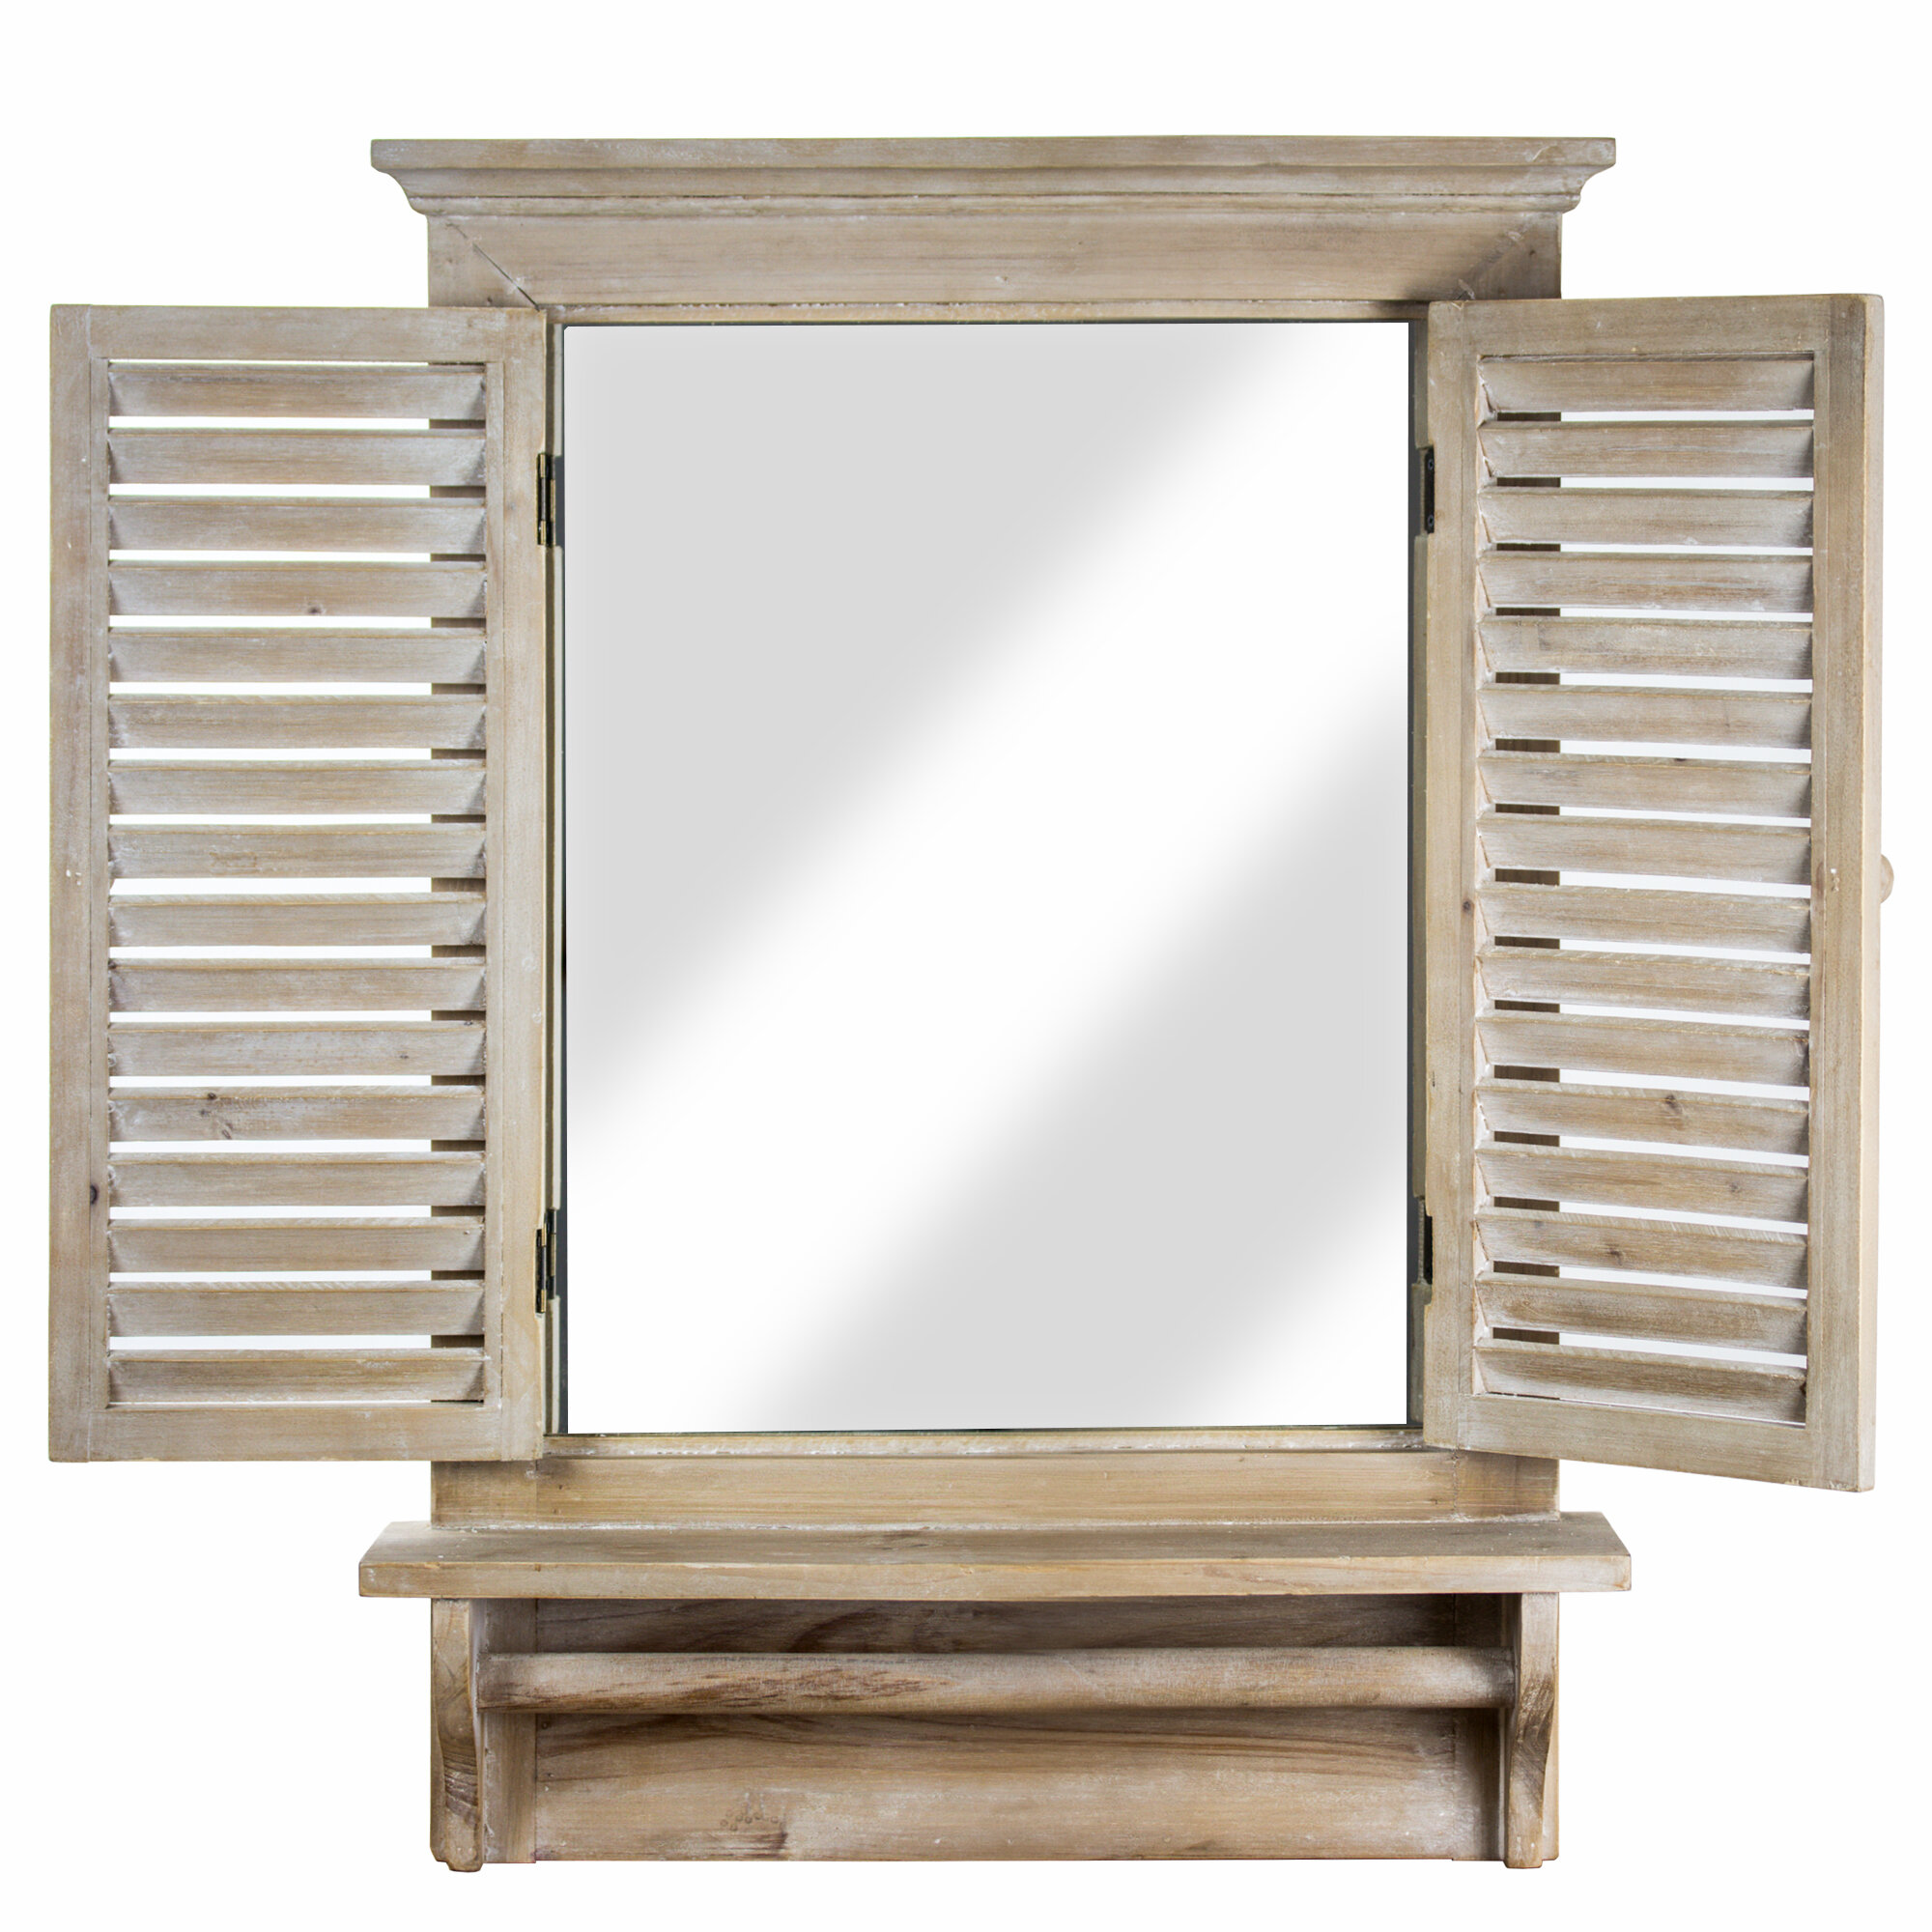 Beige Shelves Wall Mirrors You Ll Love In 2021 Wayfair